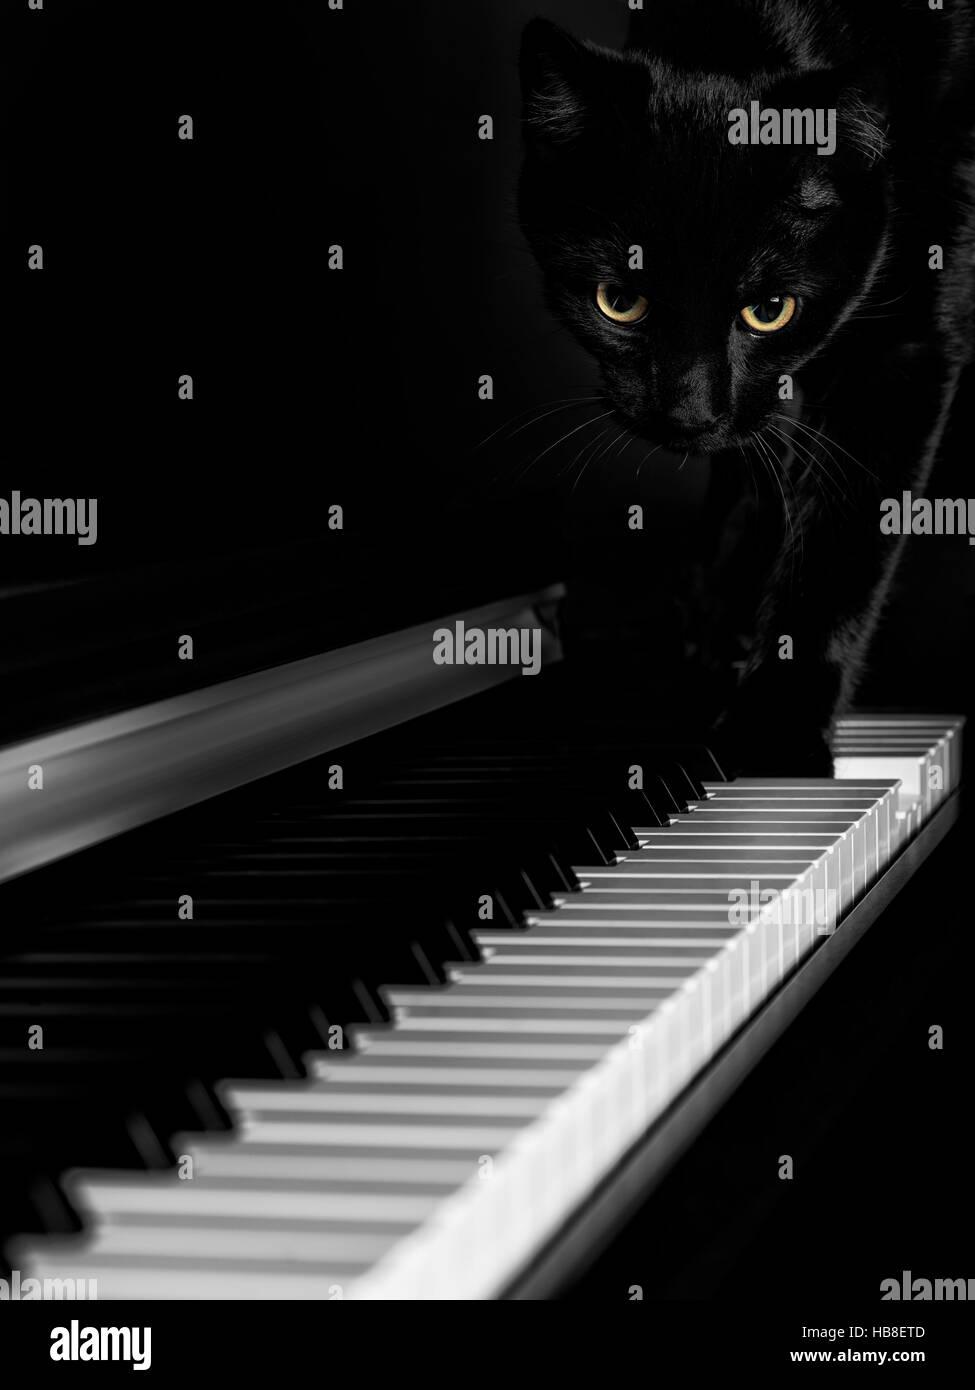 Black cat walking on a piano keyboard - Stock Image